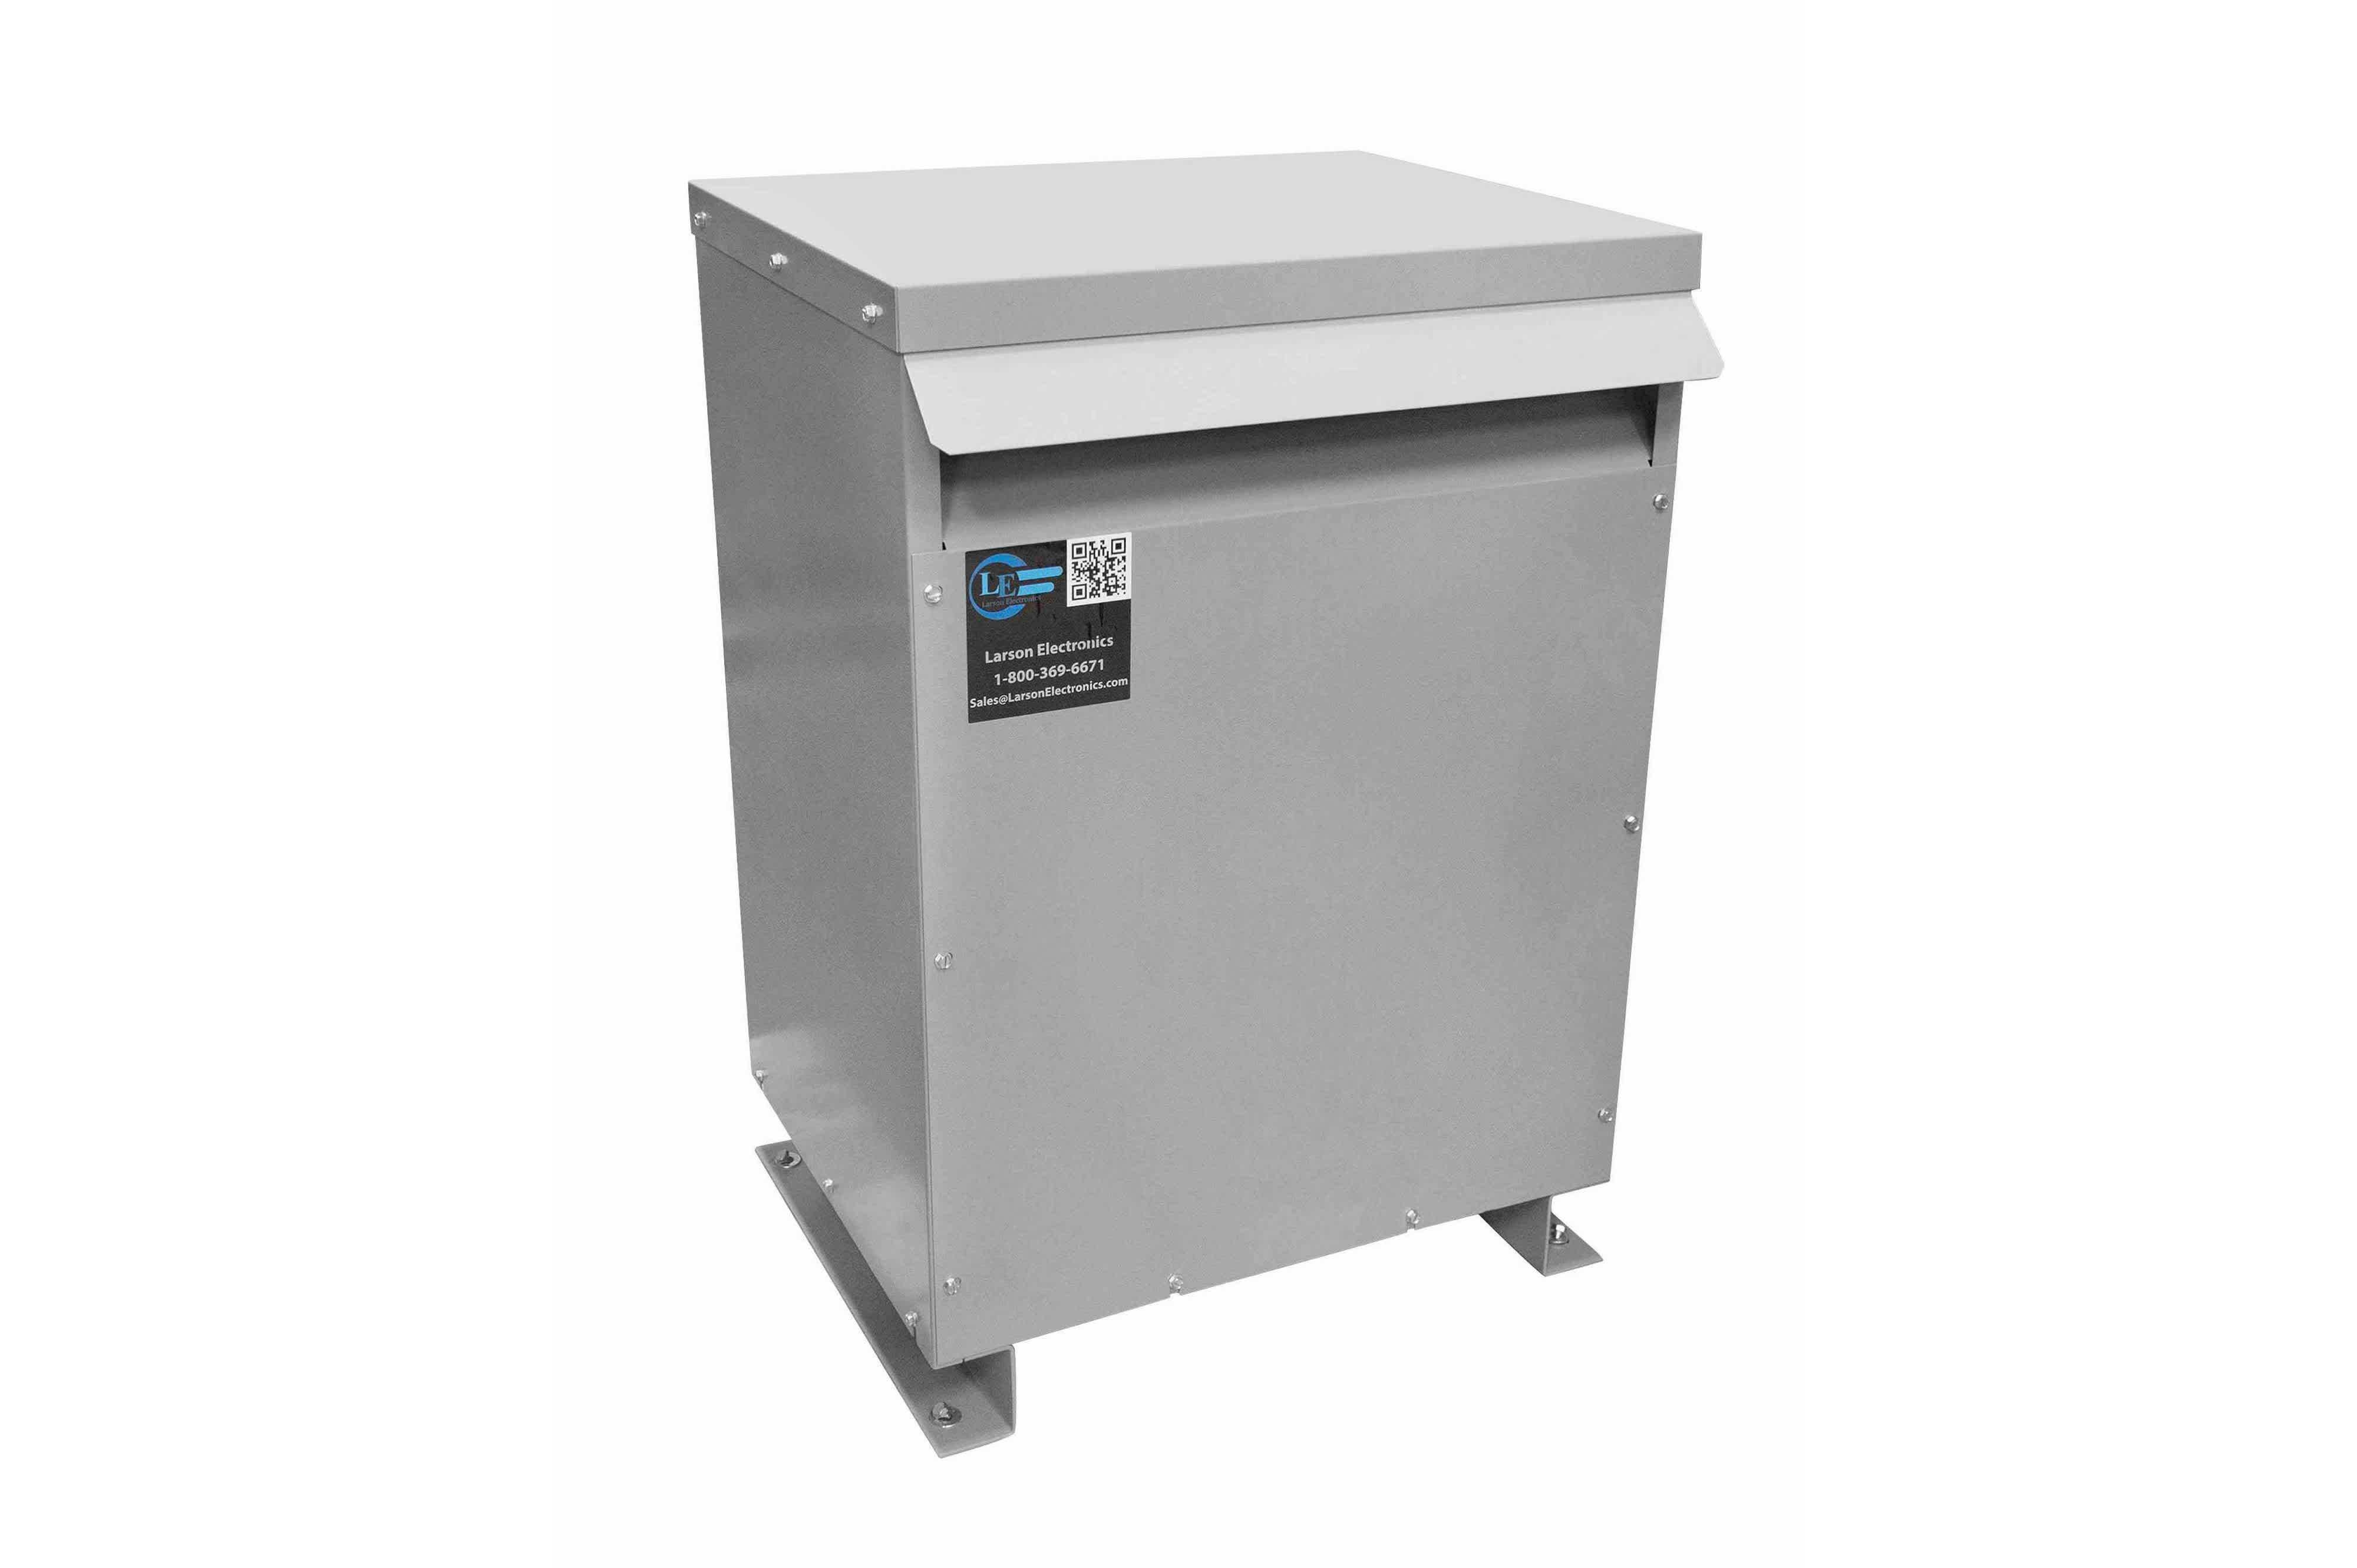 150 kVA 3PH Isolation Transformer, 575V Wye Primary, 208Y/120 Wye-N Secondary, N3R, Ventilated, 60 Hz